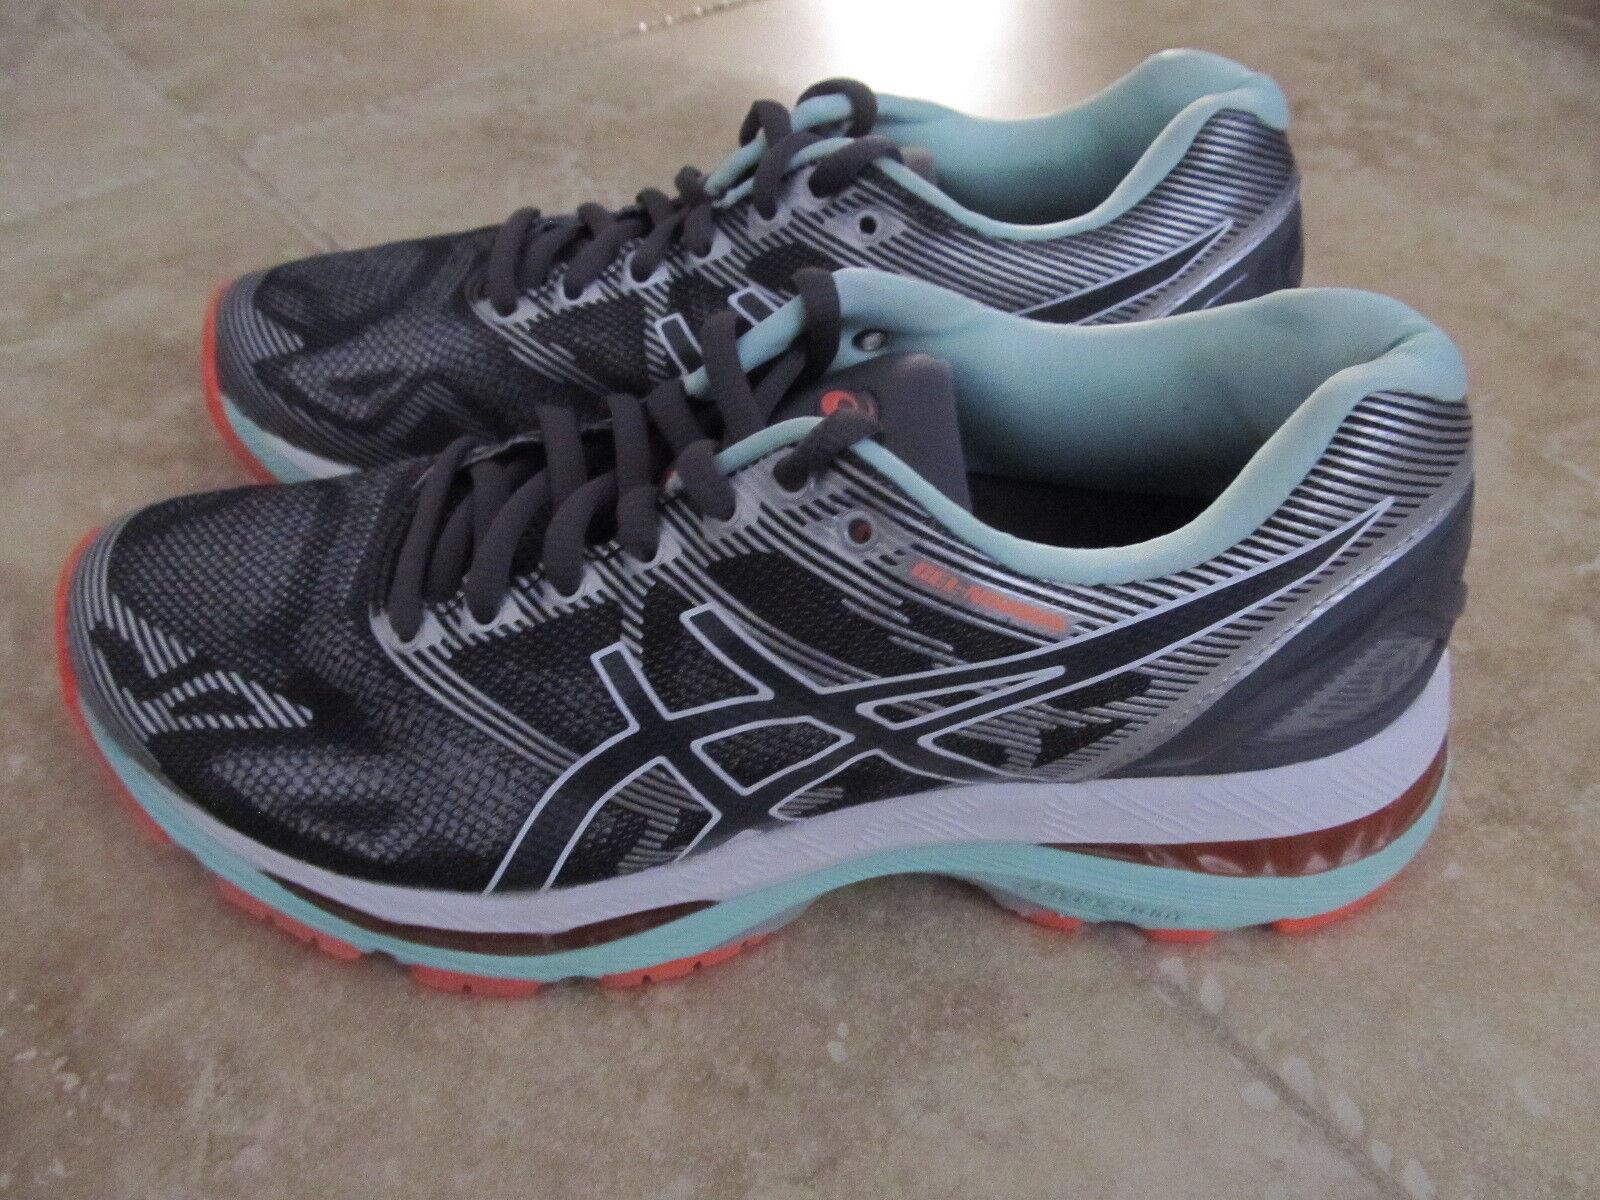 Women's Asics Gel Nimbus 19 Runinng Shoes  Carbon White Flash Coral Comfortable Seasonal clearance sale